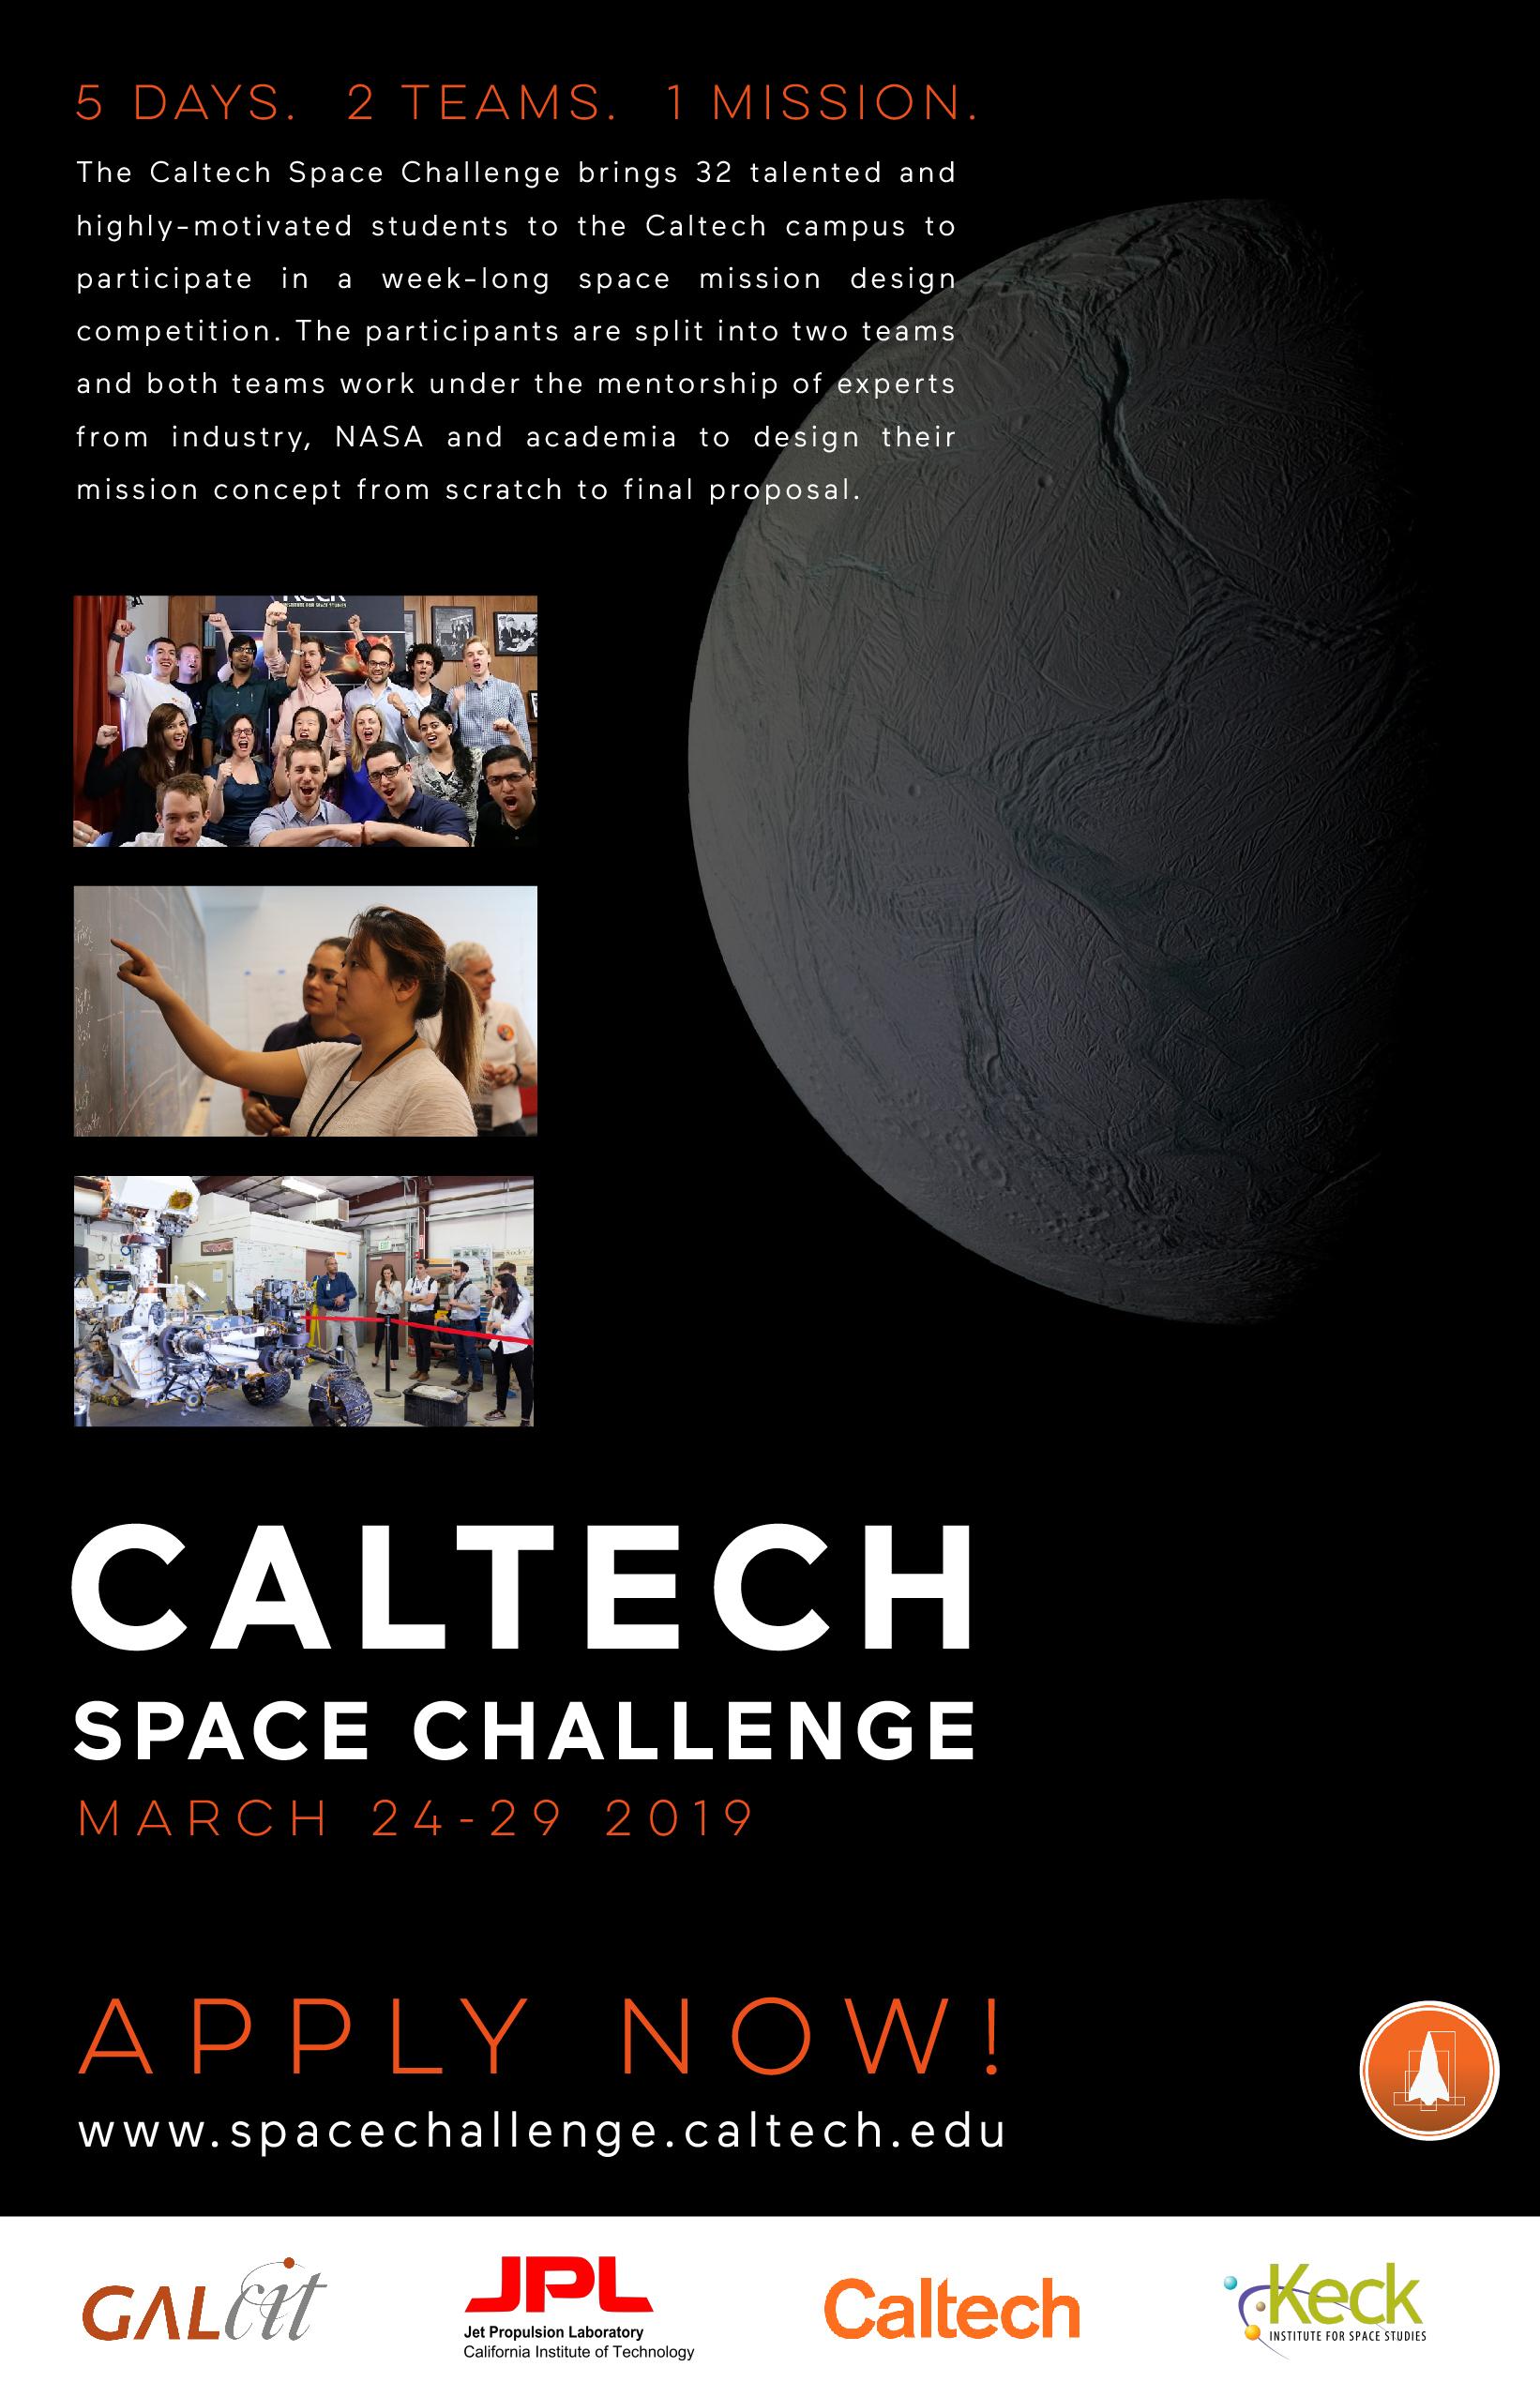 internship job announcements 2018 oasa Georgetown Electrical Engineering competition encelanders \u2013 caltech space challenge 2019